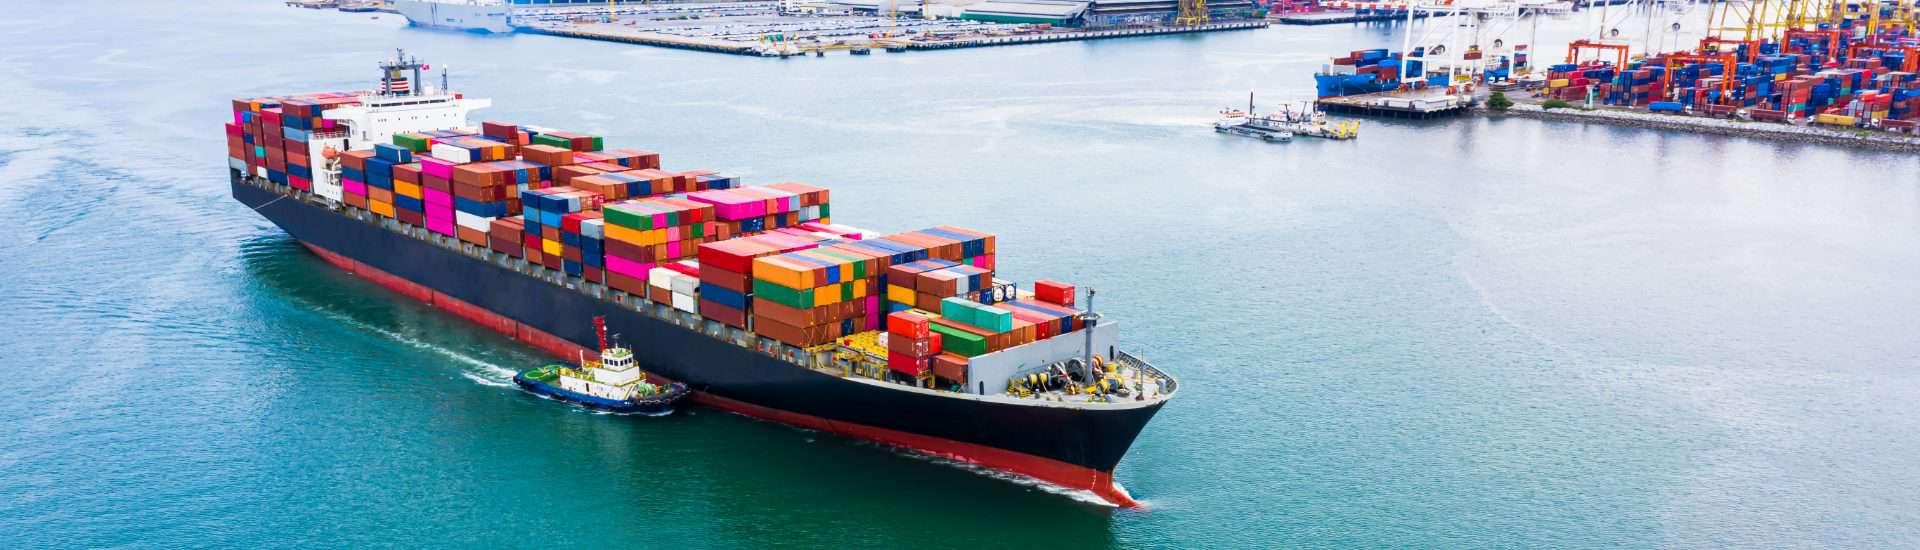 china-sea-freight-image